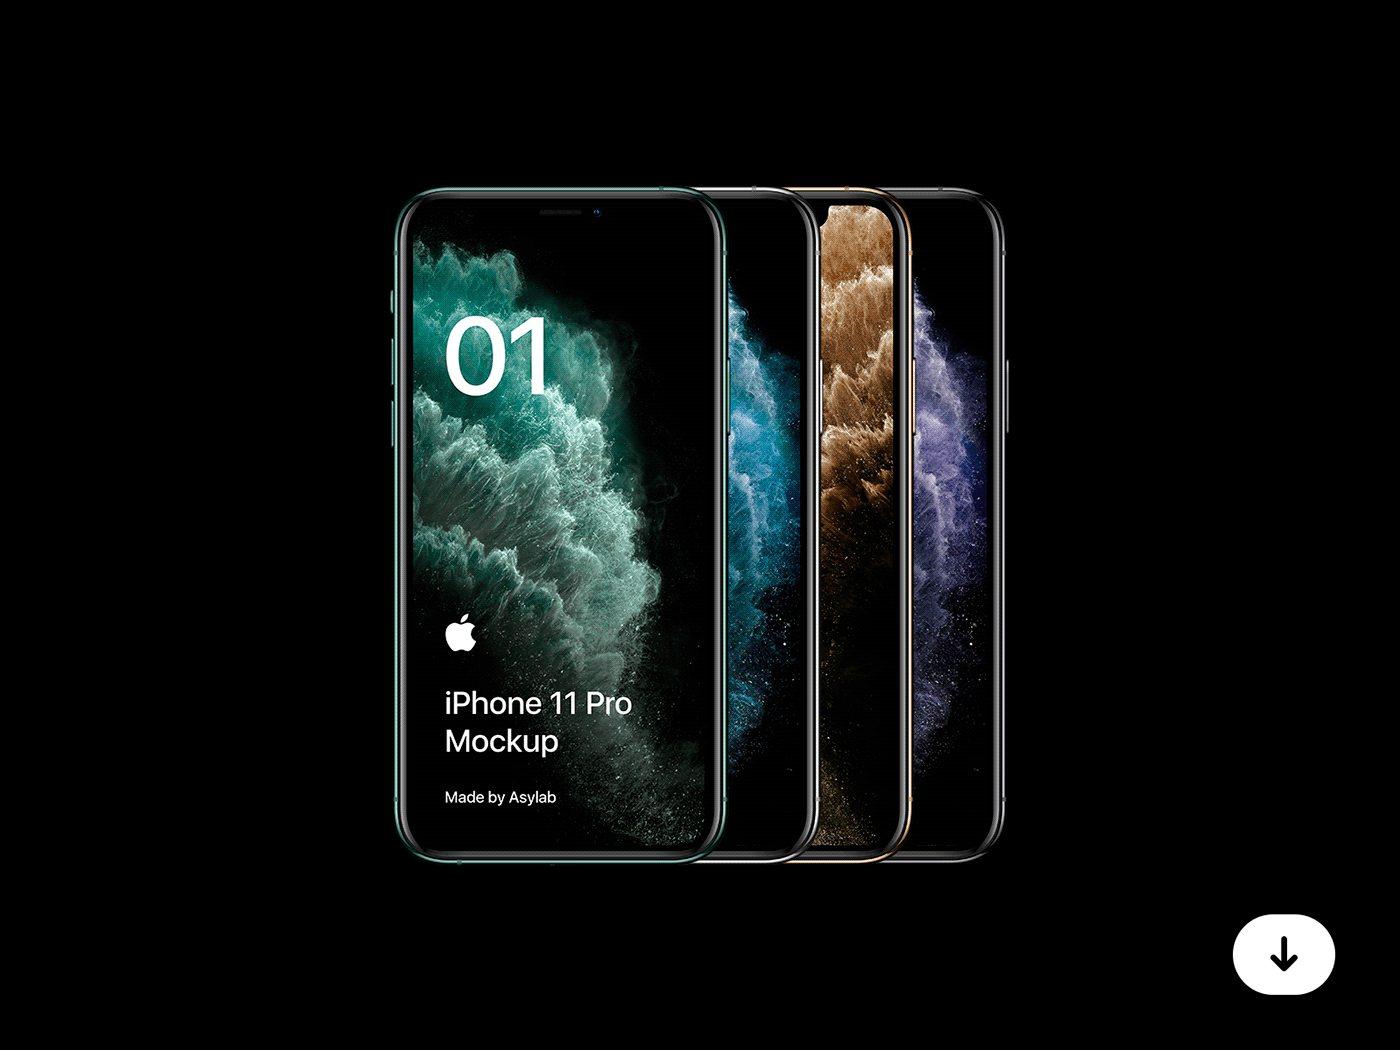 Free iPhone 11 Pro Mockup PSD